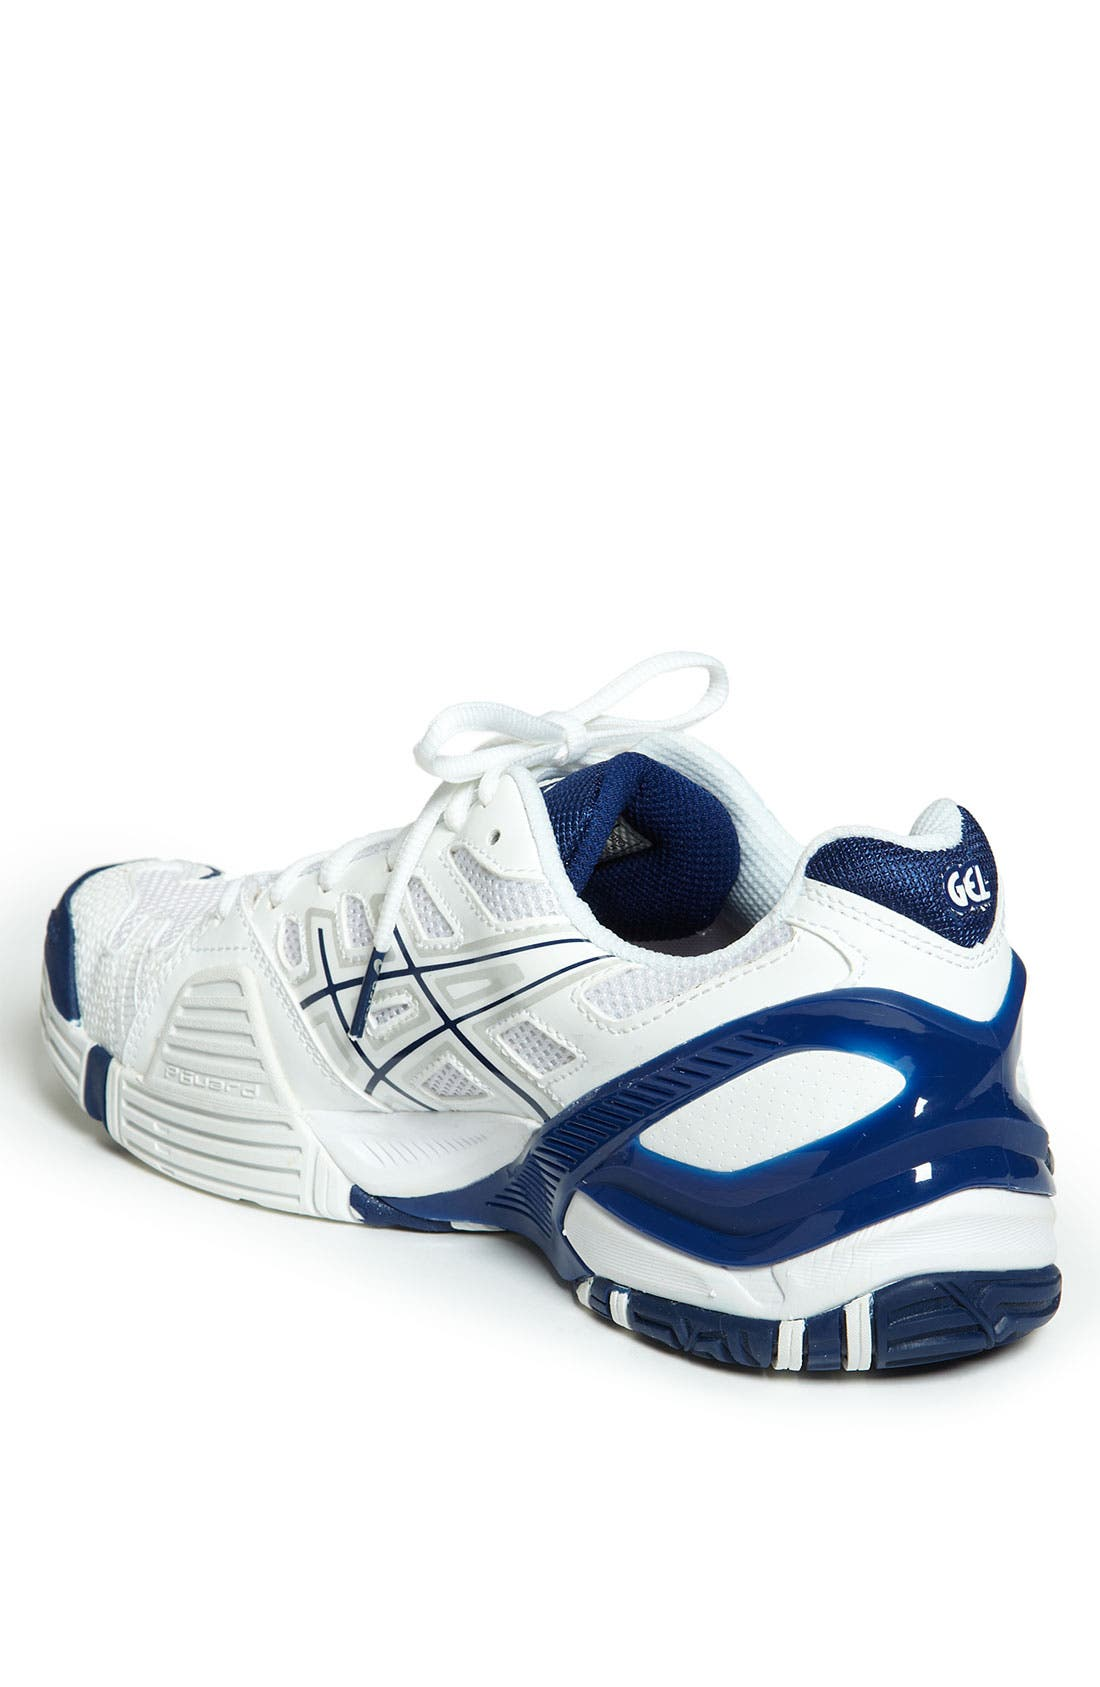 Alternate Image 2  - ASICS® 'GEL-Resolution 4' Tennis Shoe (Men)